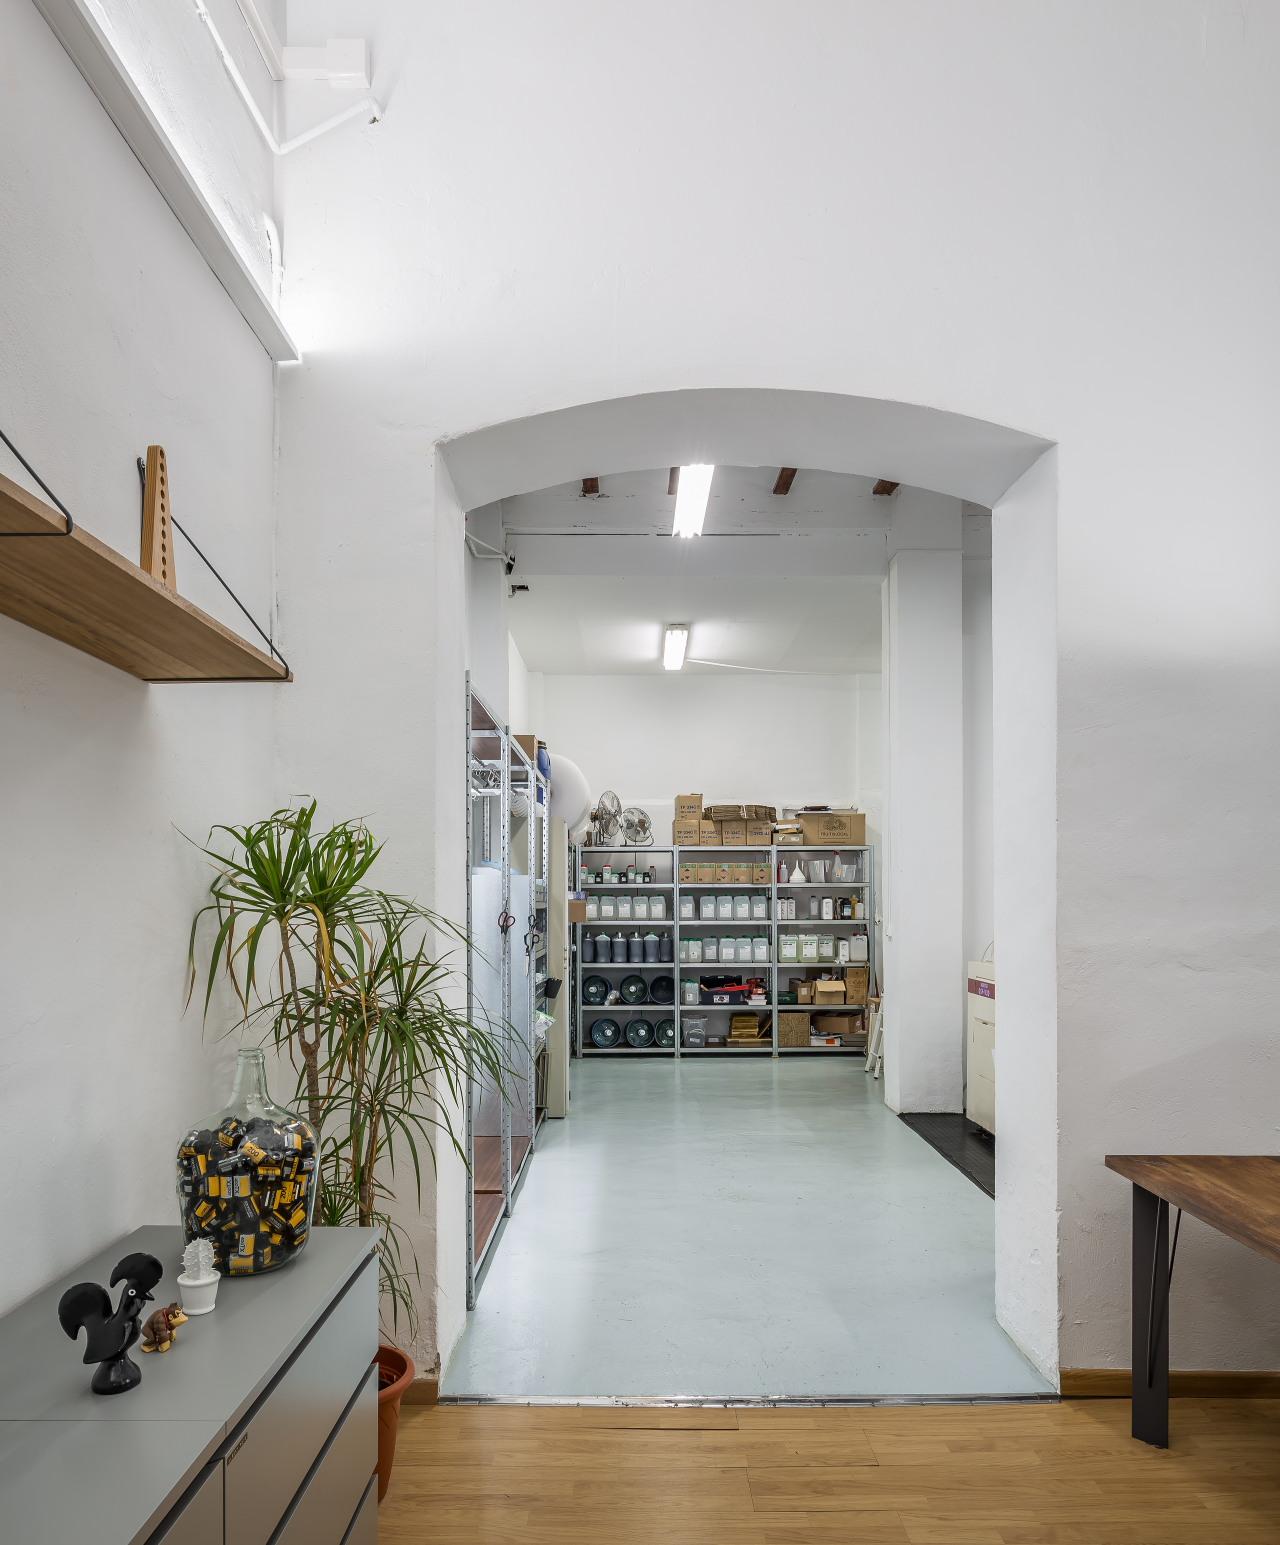 fotografia-arquitectura-interiorismo-valencia-german-cabo-boubau-carmencita-carmencitafilmlab (22)